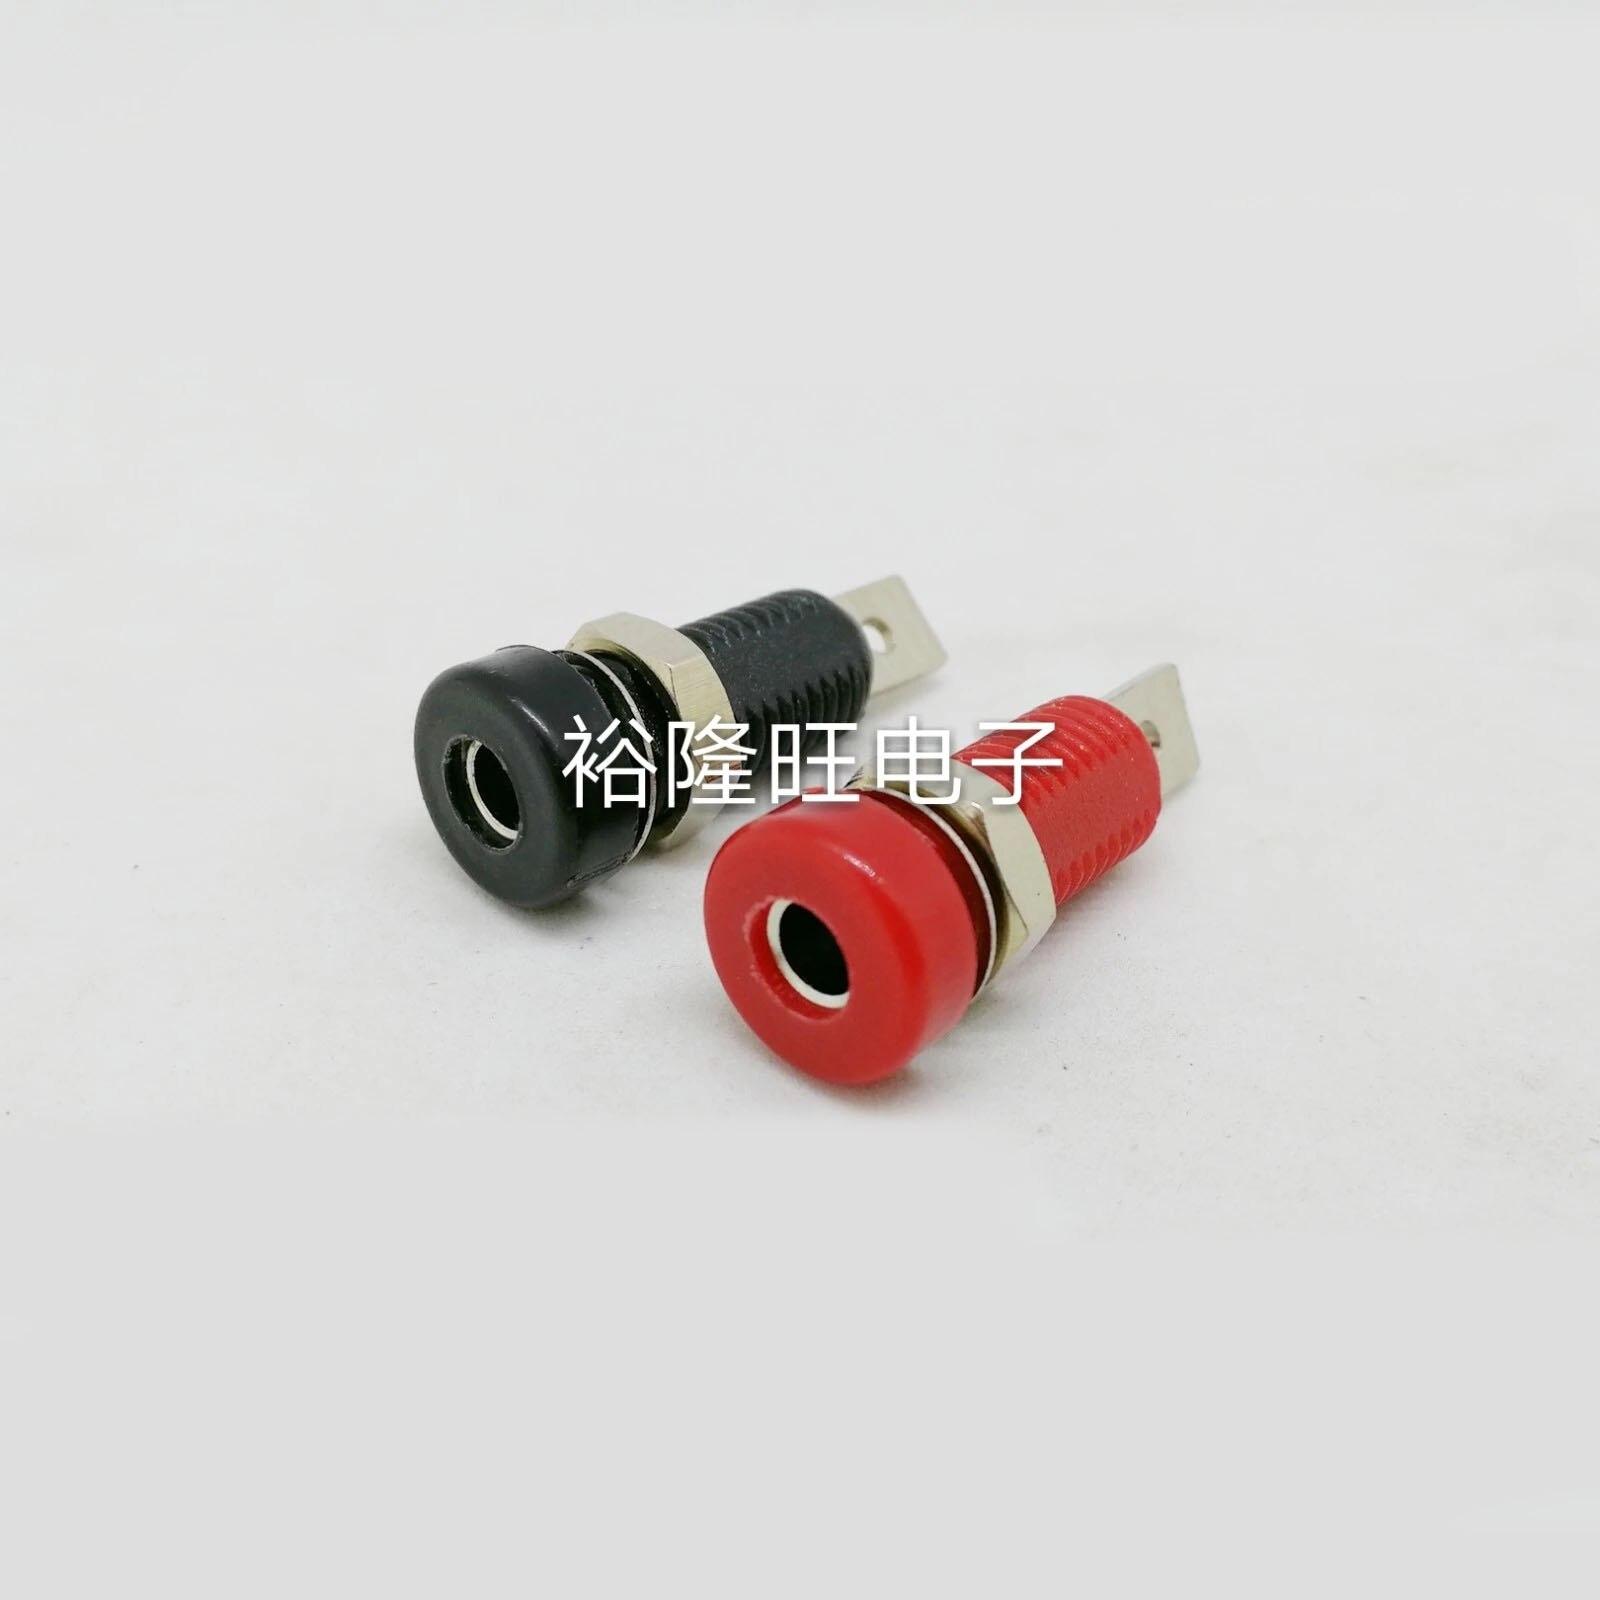 Smonisia 200pcs/lot Copper Banana Connector 4mm High Pressure Temperature Resistant Speaker Model Aircraft Terminal Socket Plug